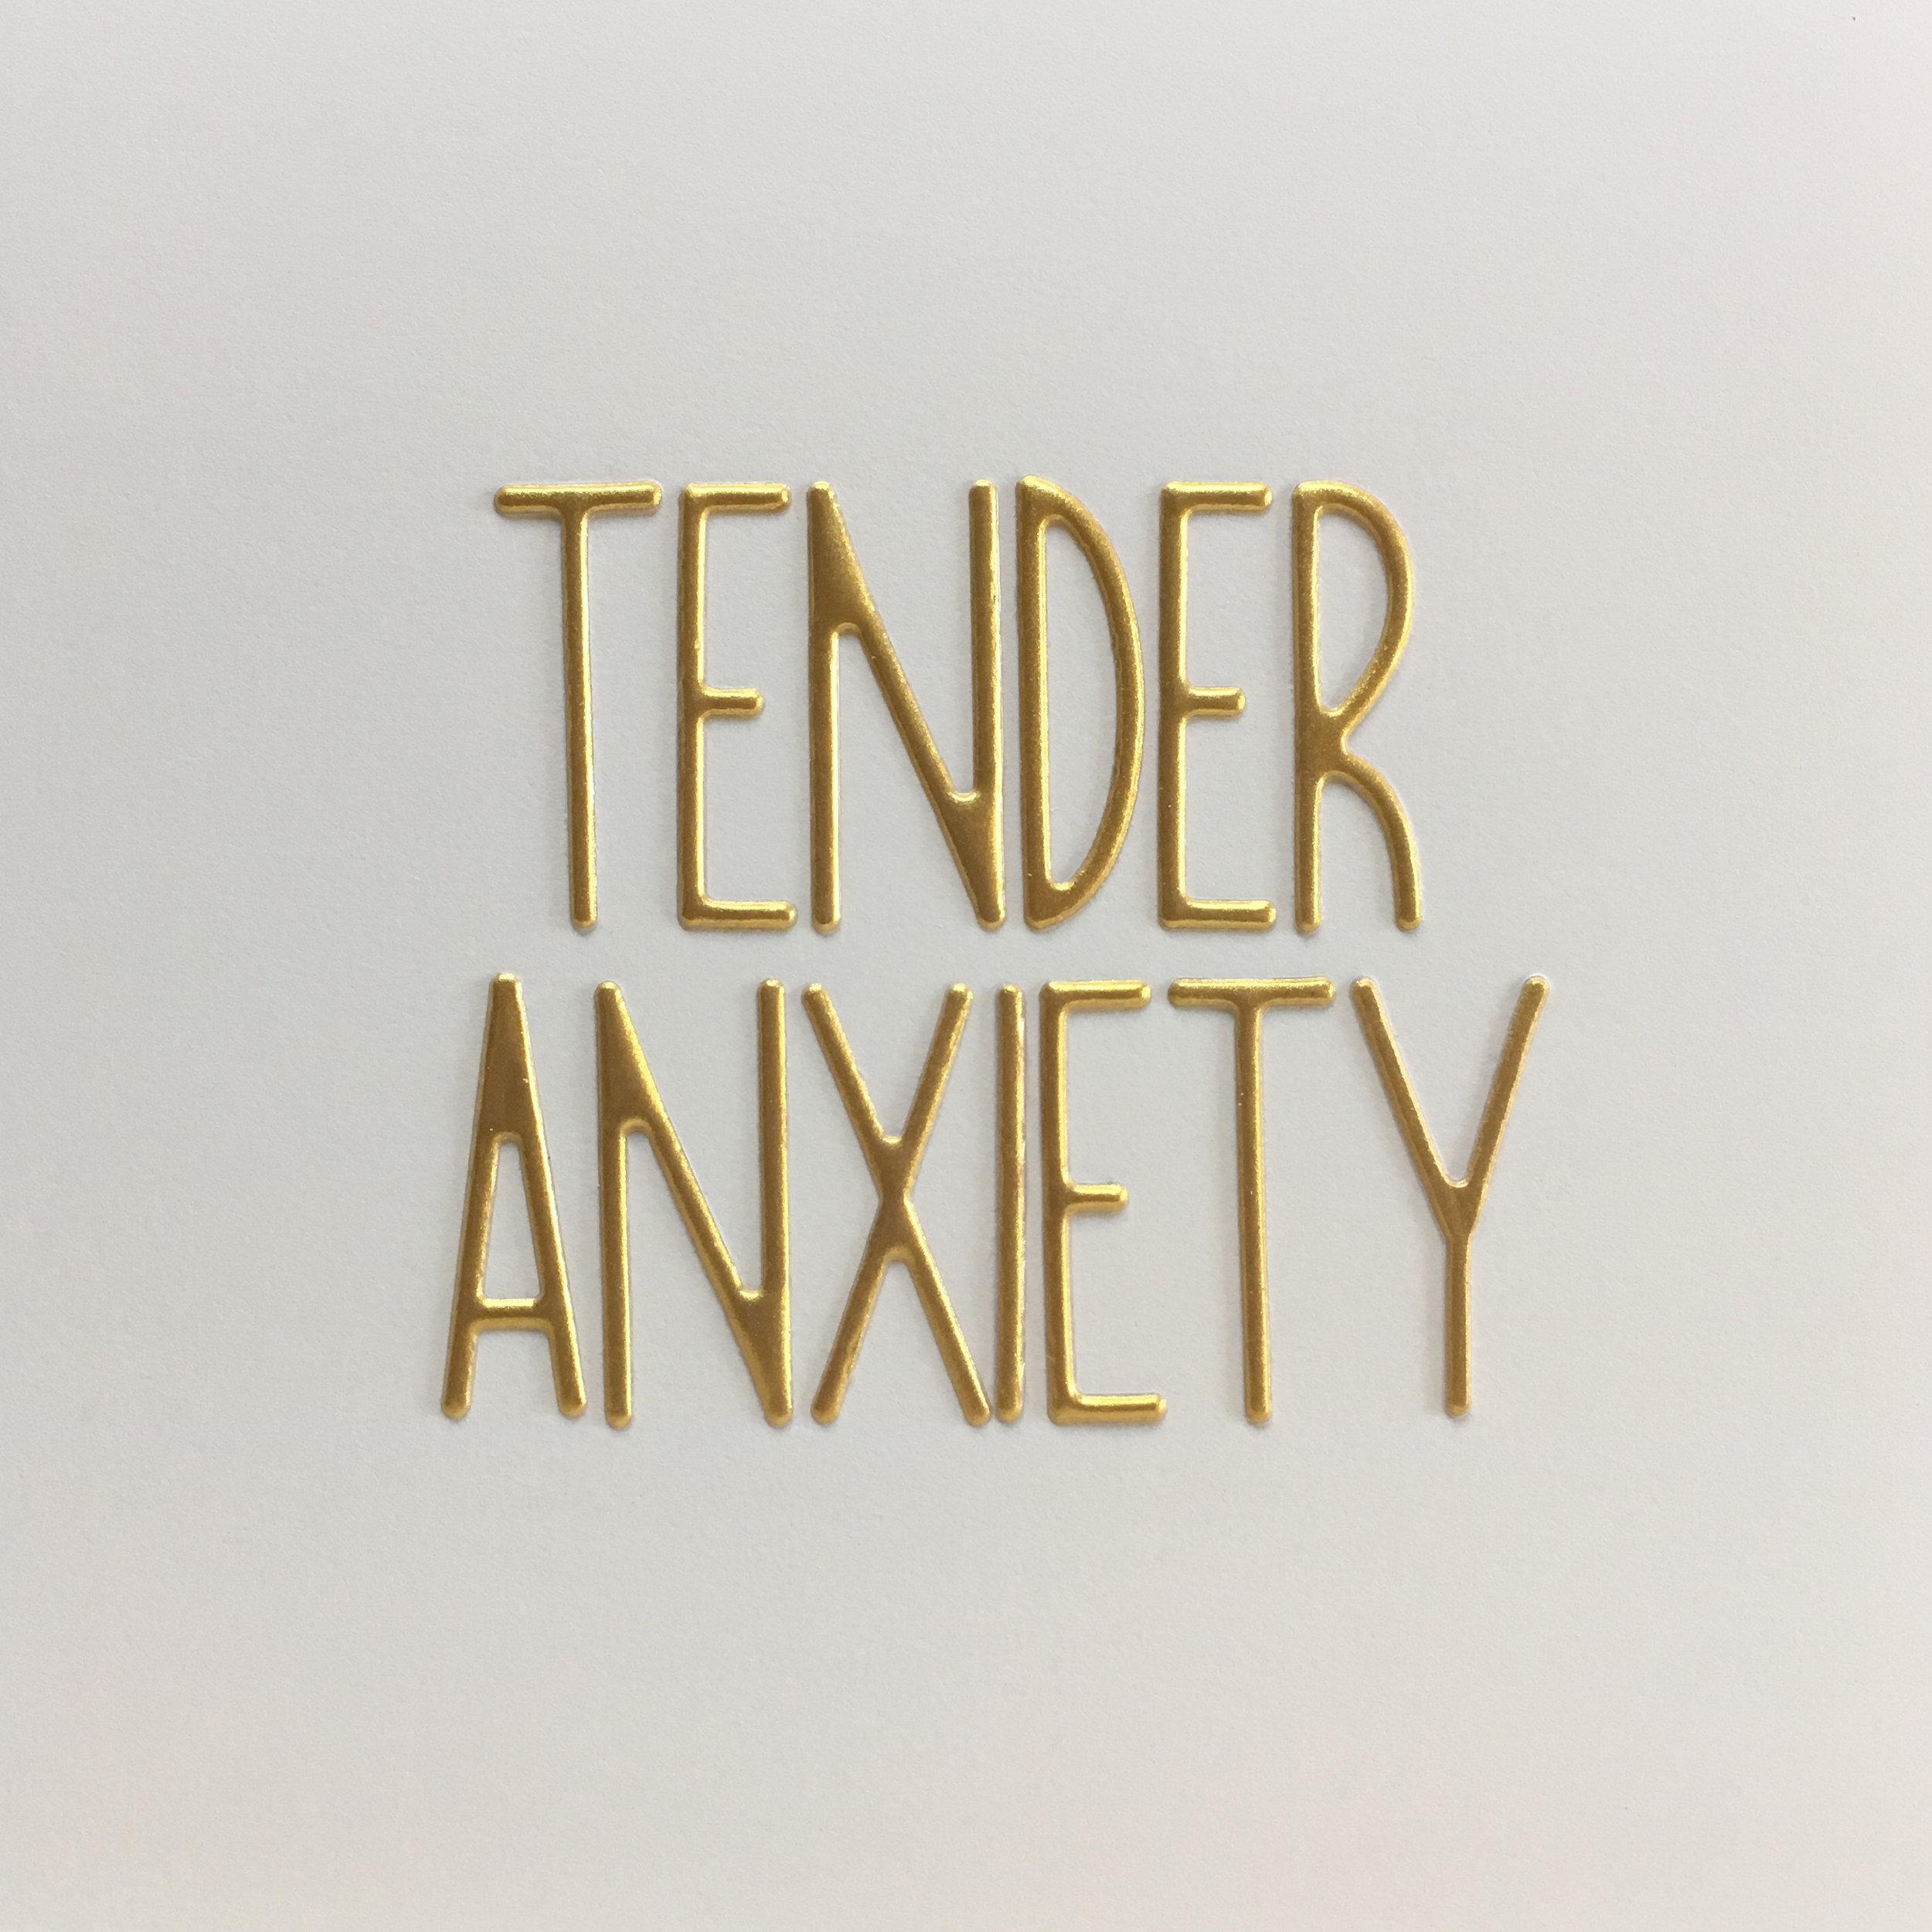 tender anxiety.jpg